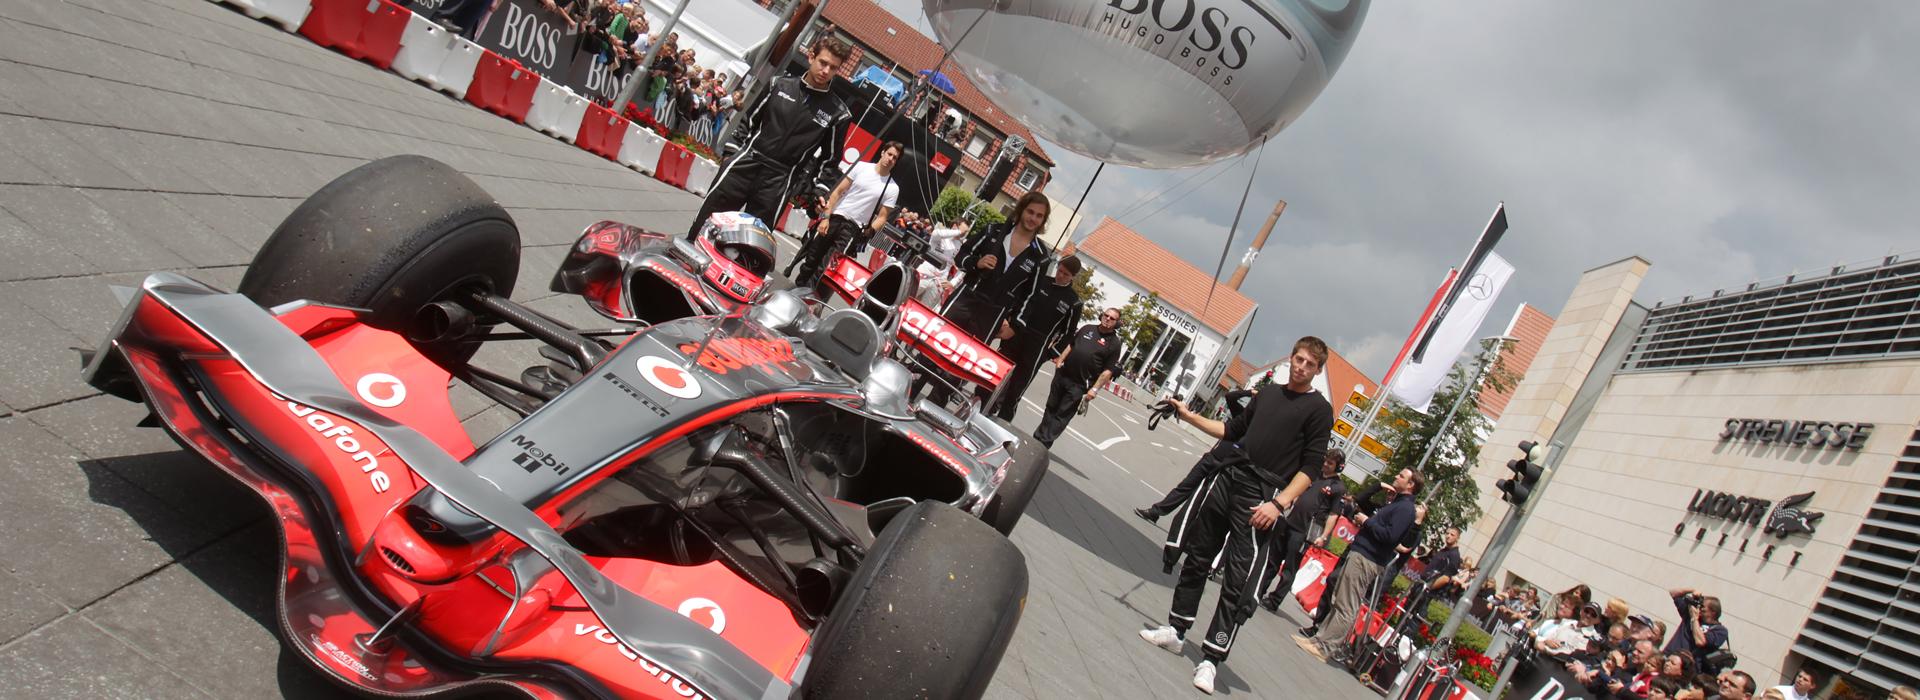 Lindenplatz in Metzingen: Formel 1 Show